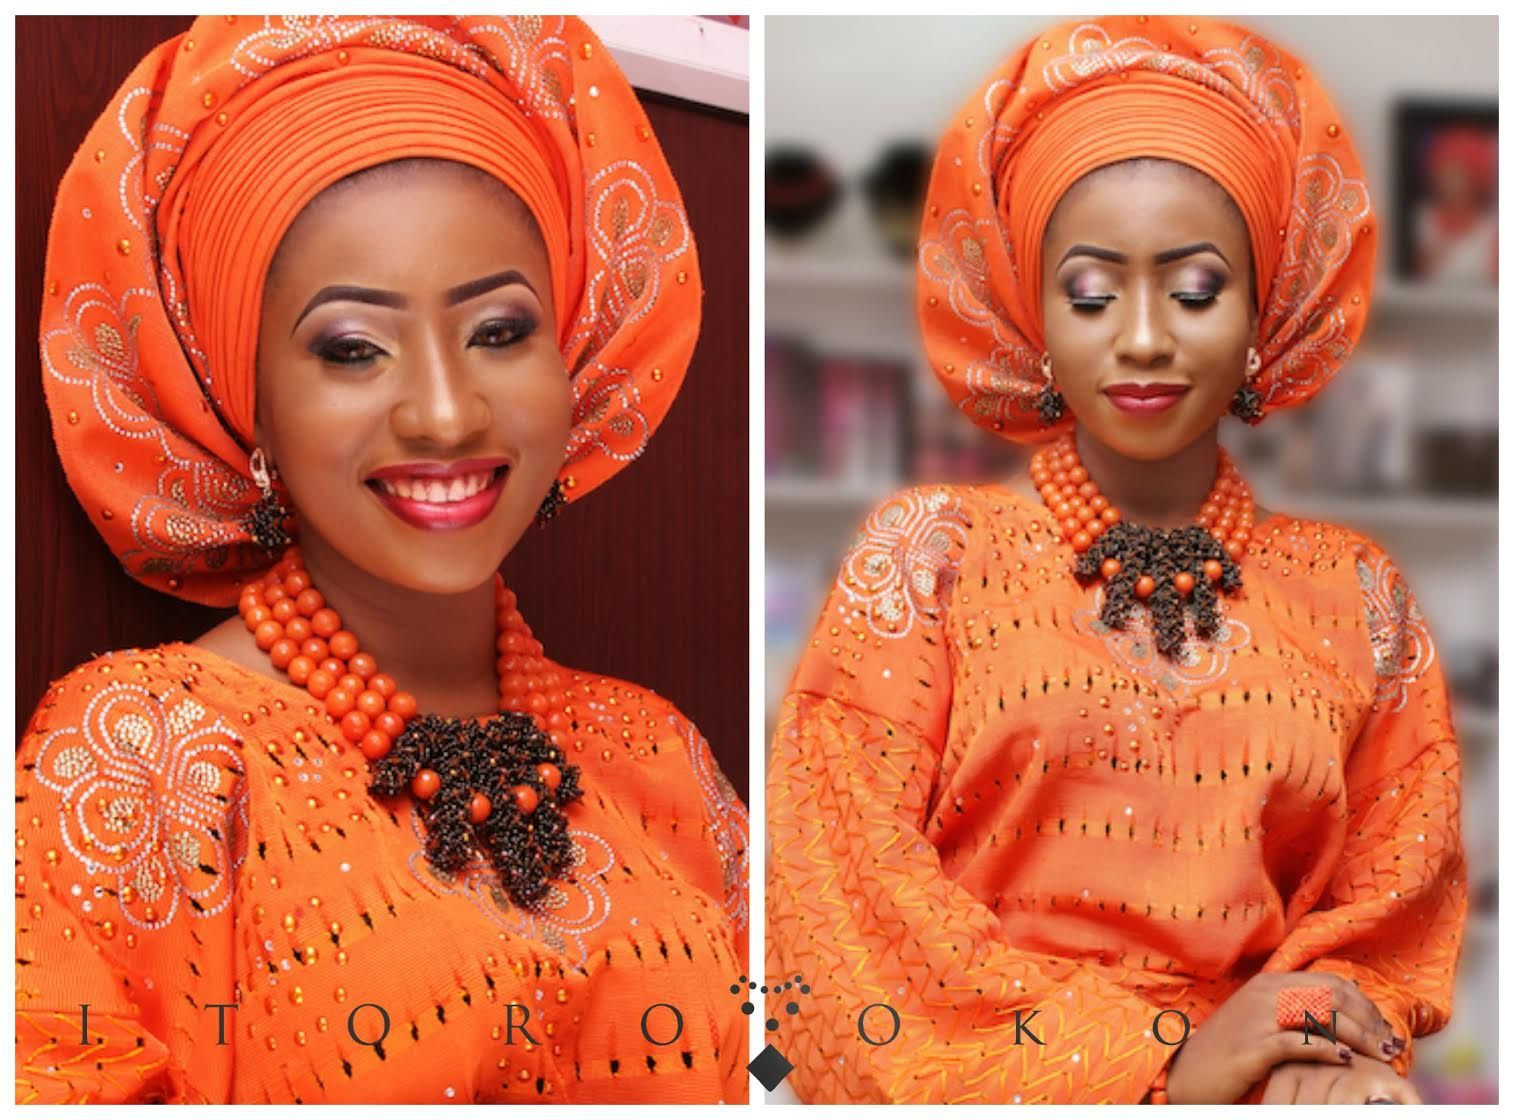 nigerian-wedding-beads-yoruba.jpg 1,514×1,120 pixels | Blessella ...